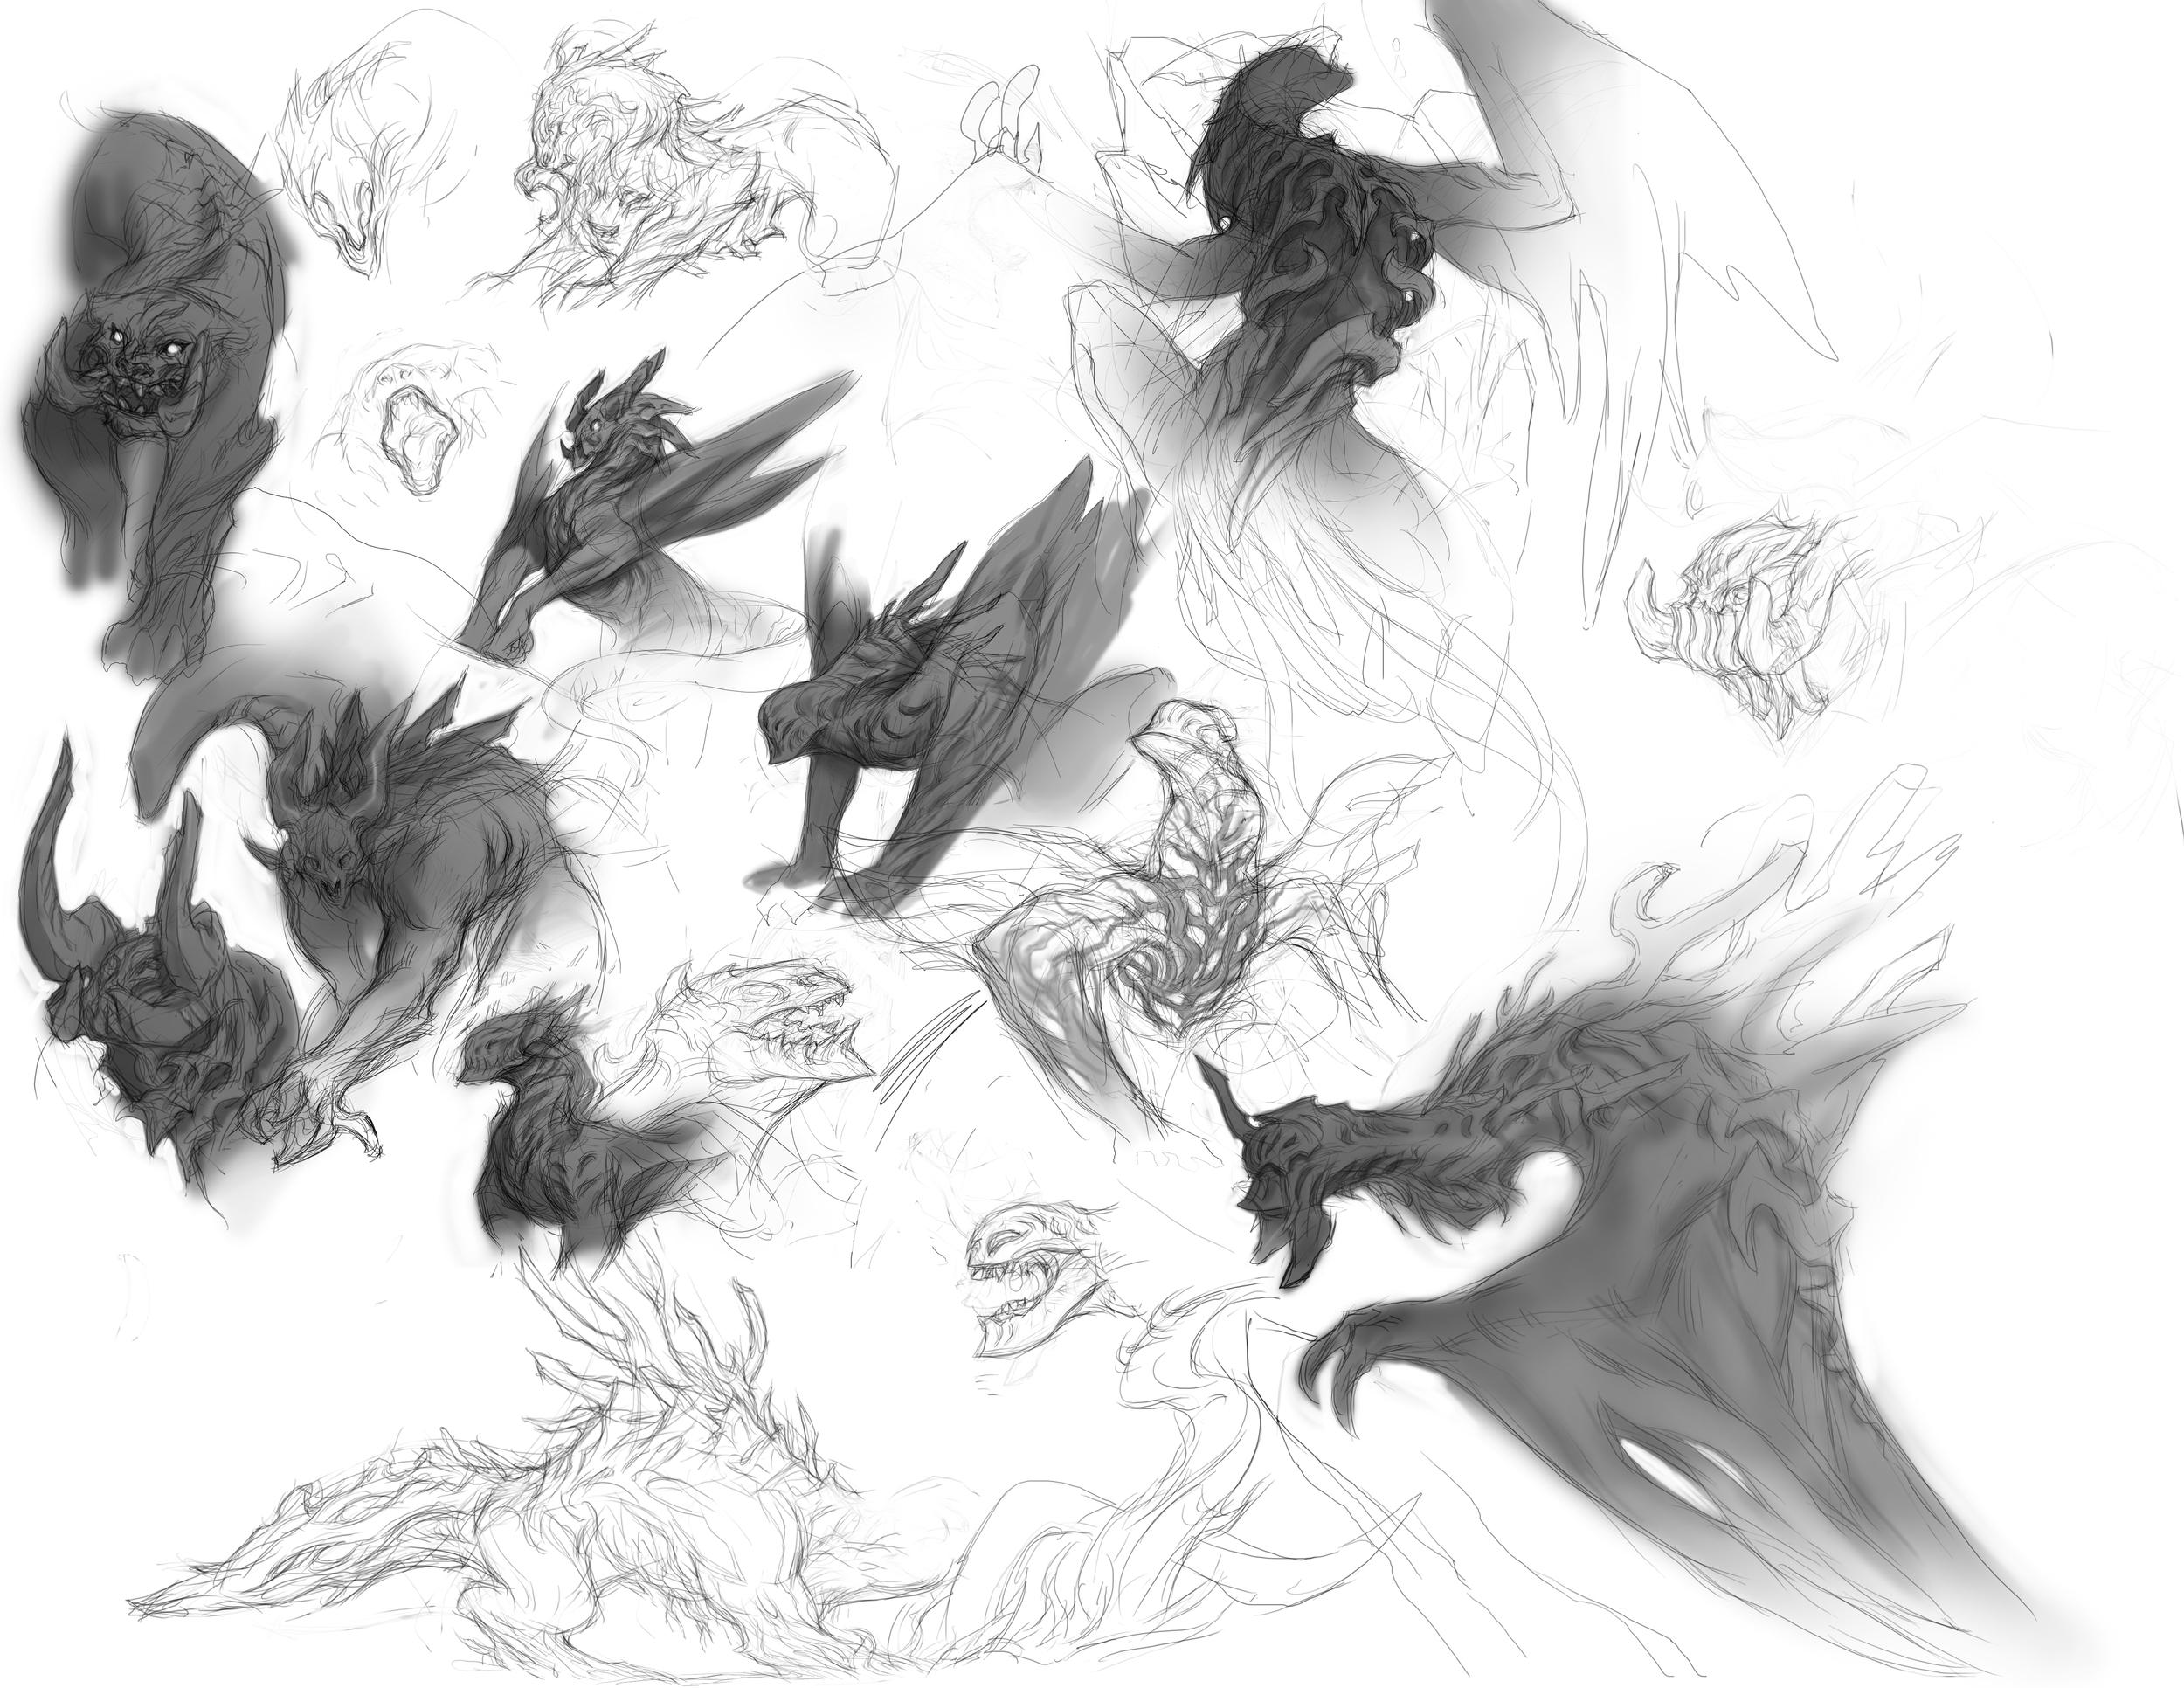 thanatos beast sketches#1.jpg